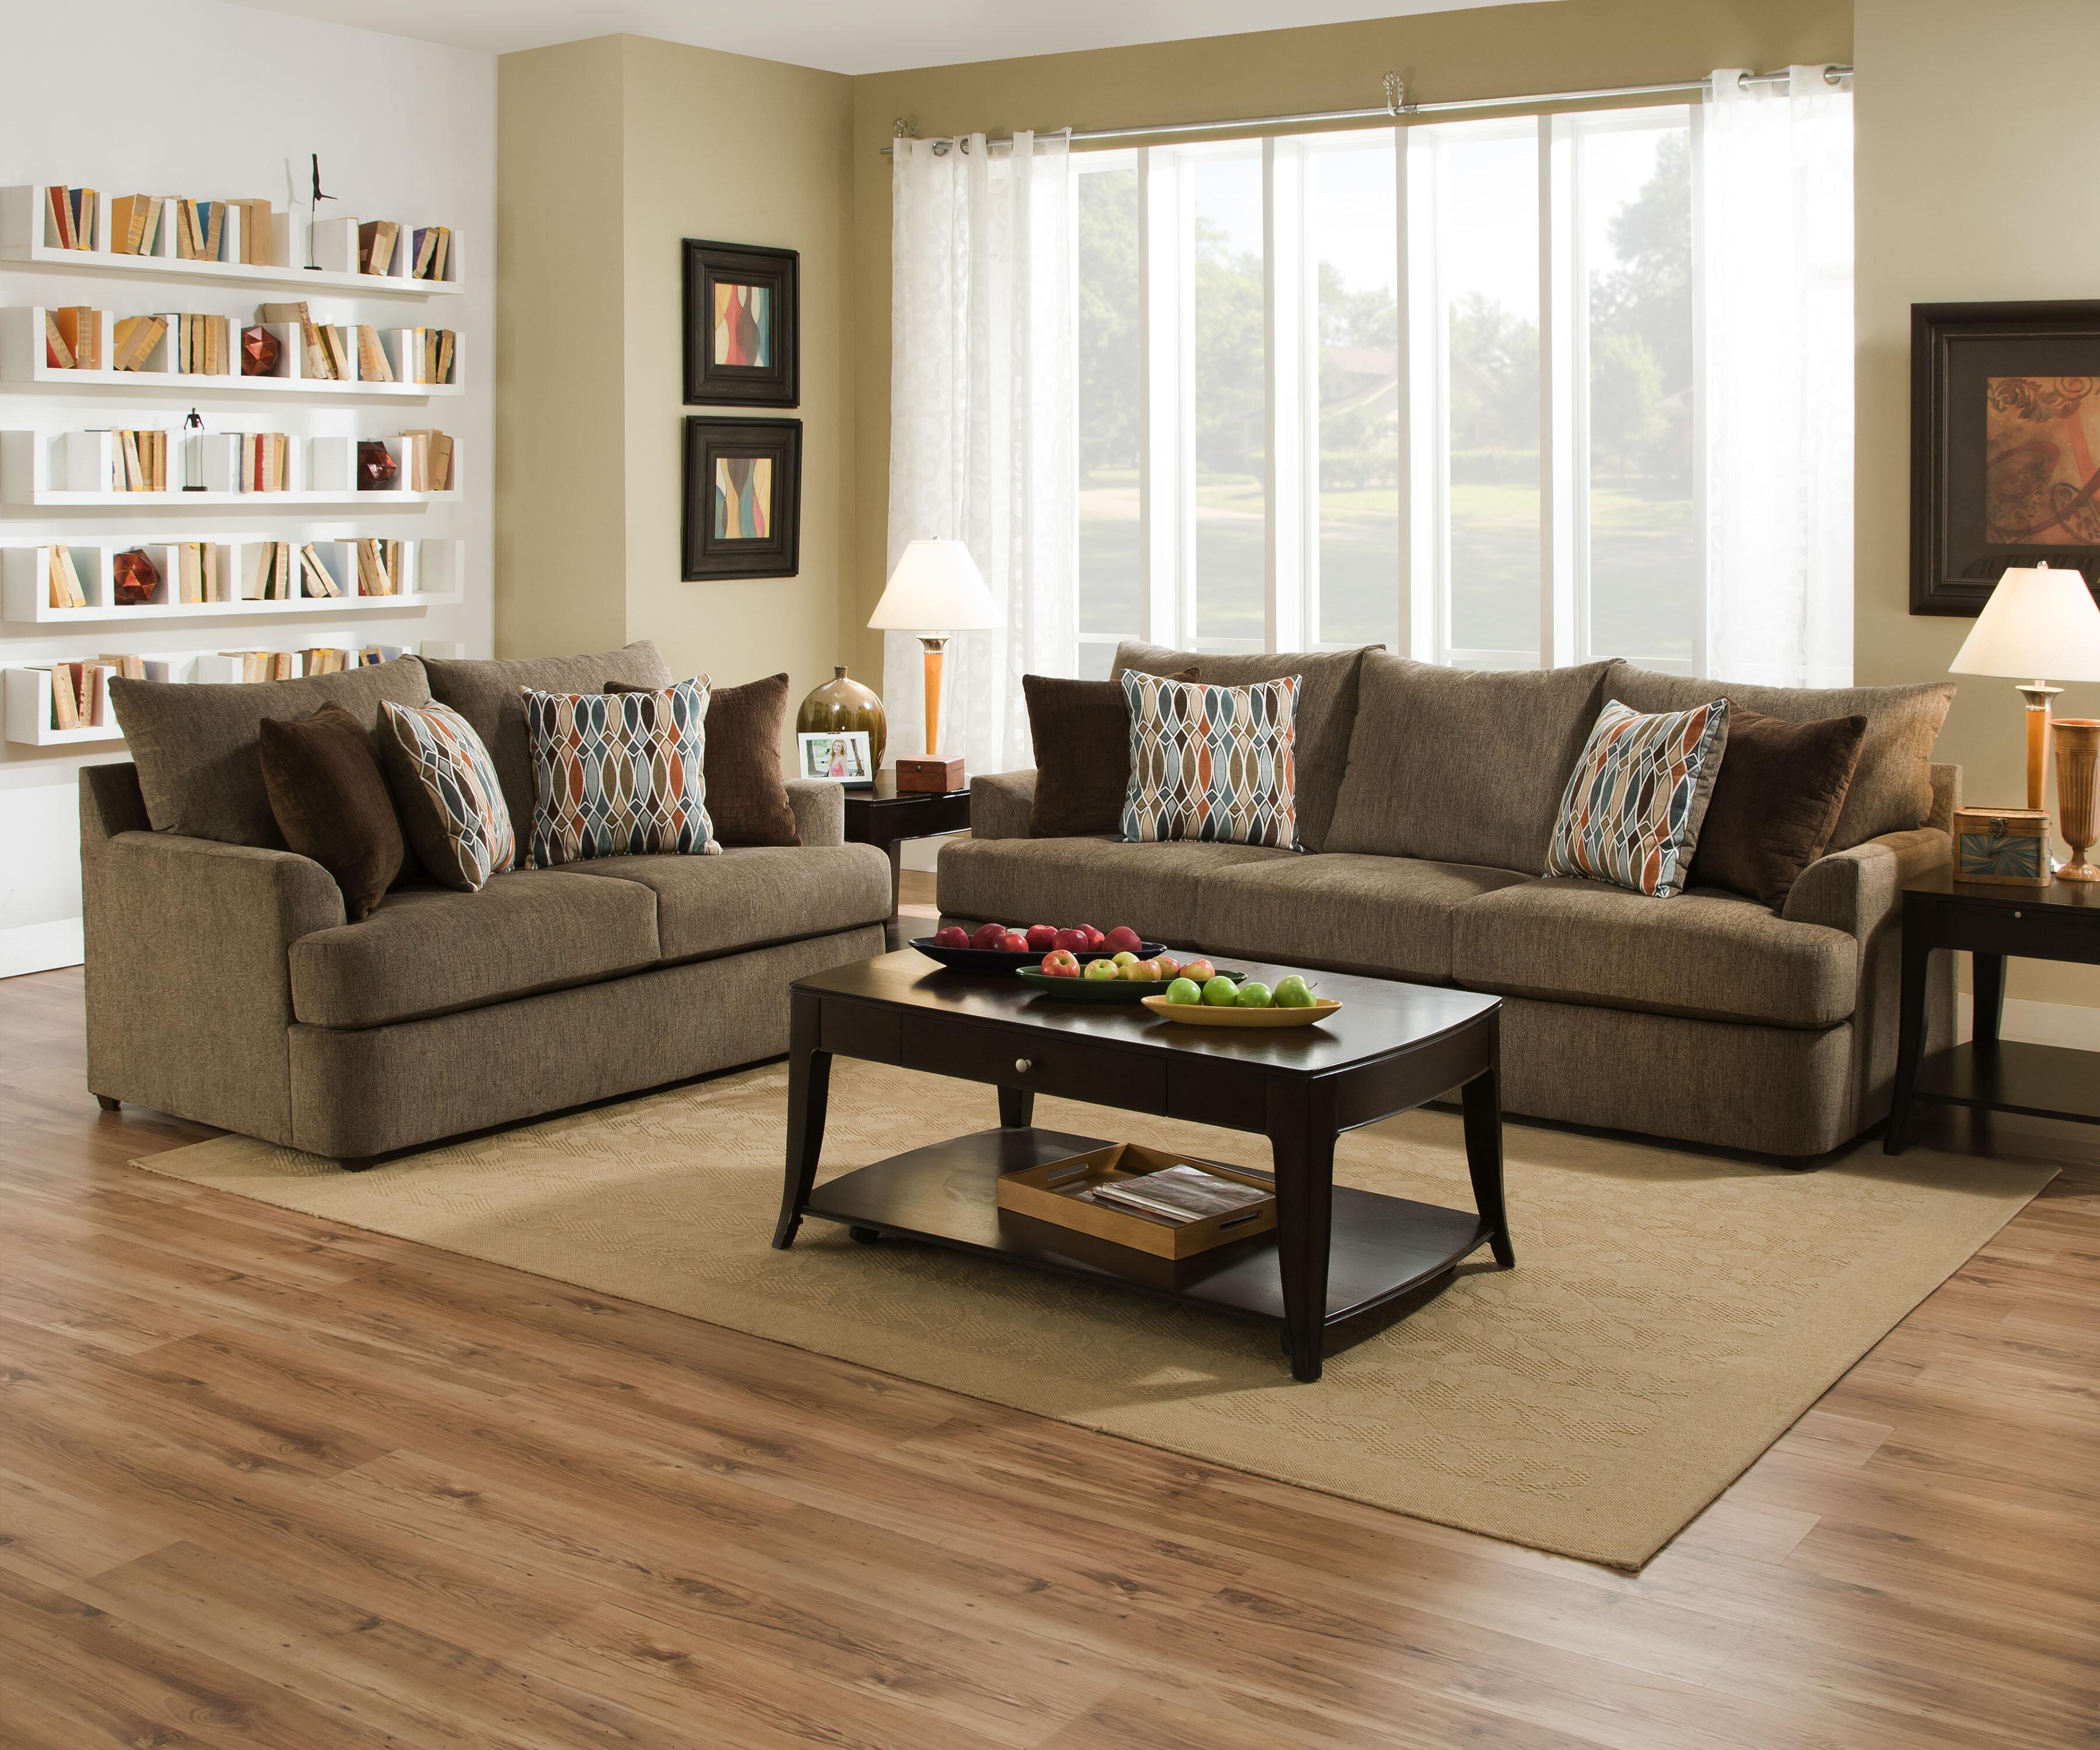 Red Barrel Studio Dizon Configurable Living Room Set Reviews Wayfair